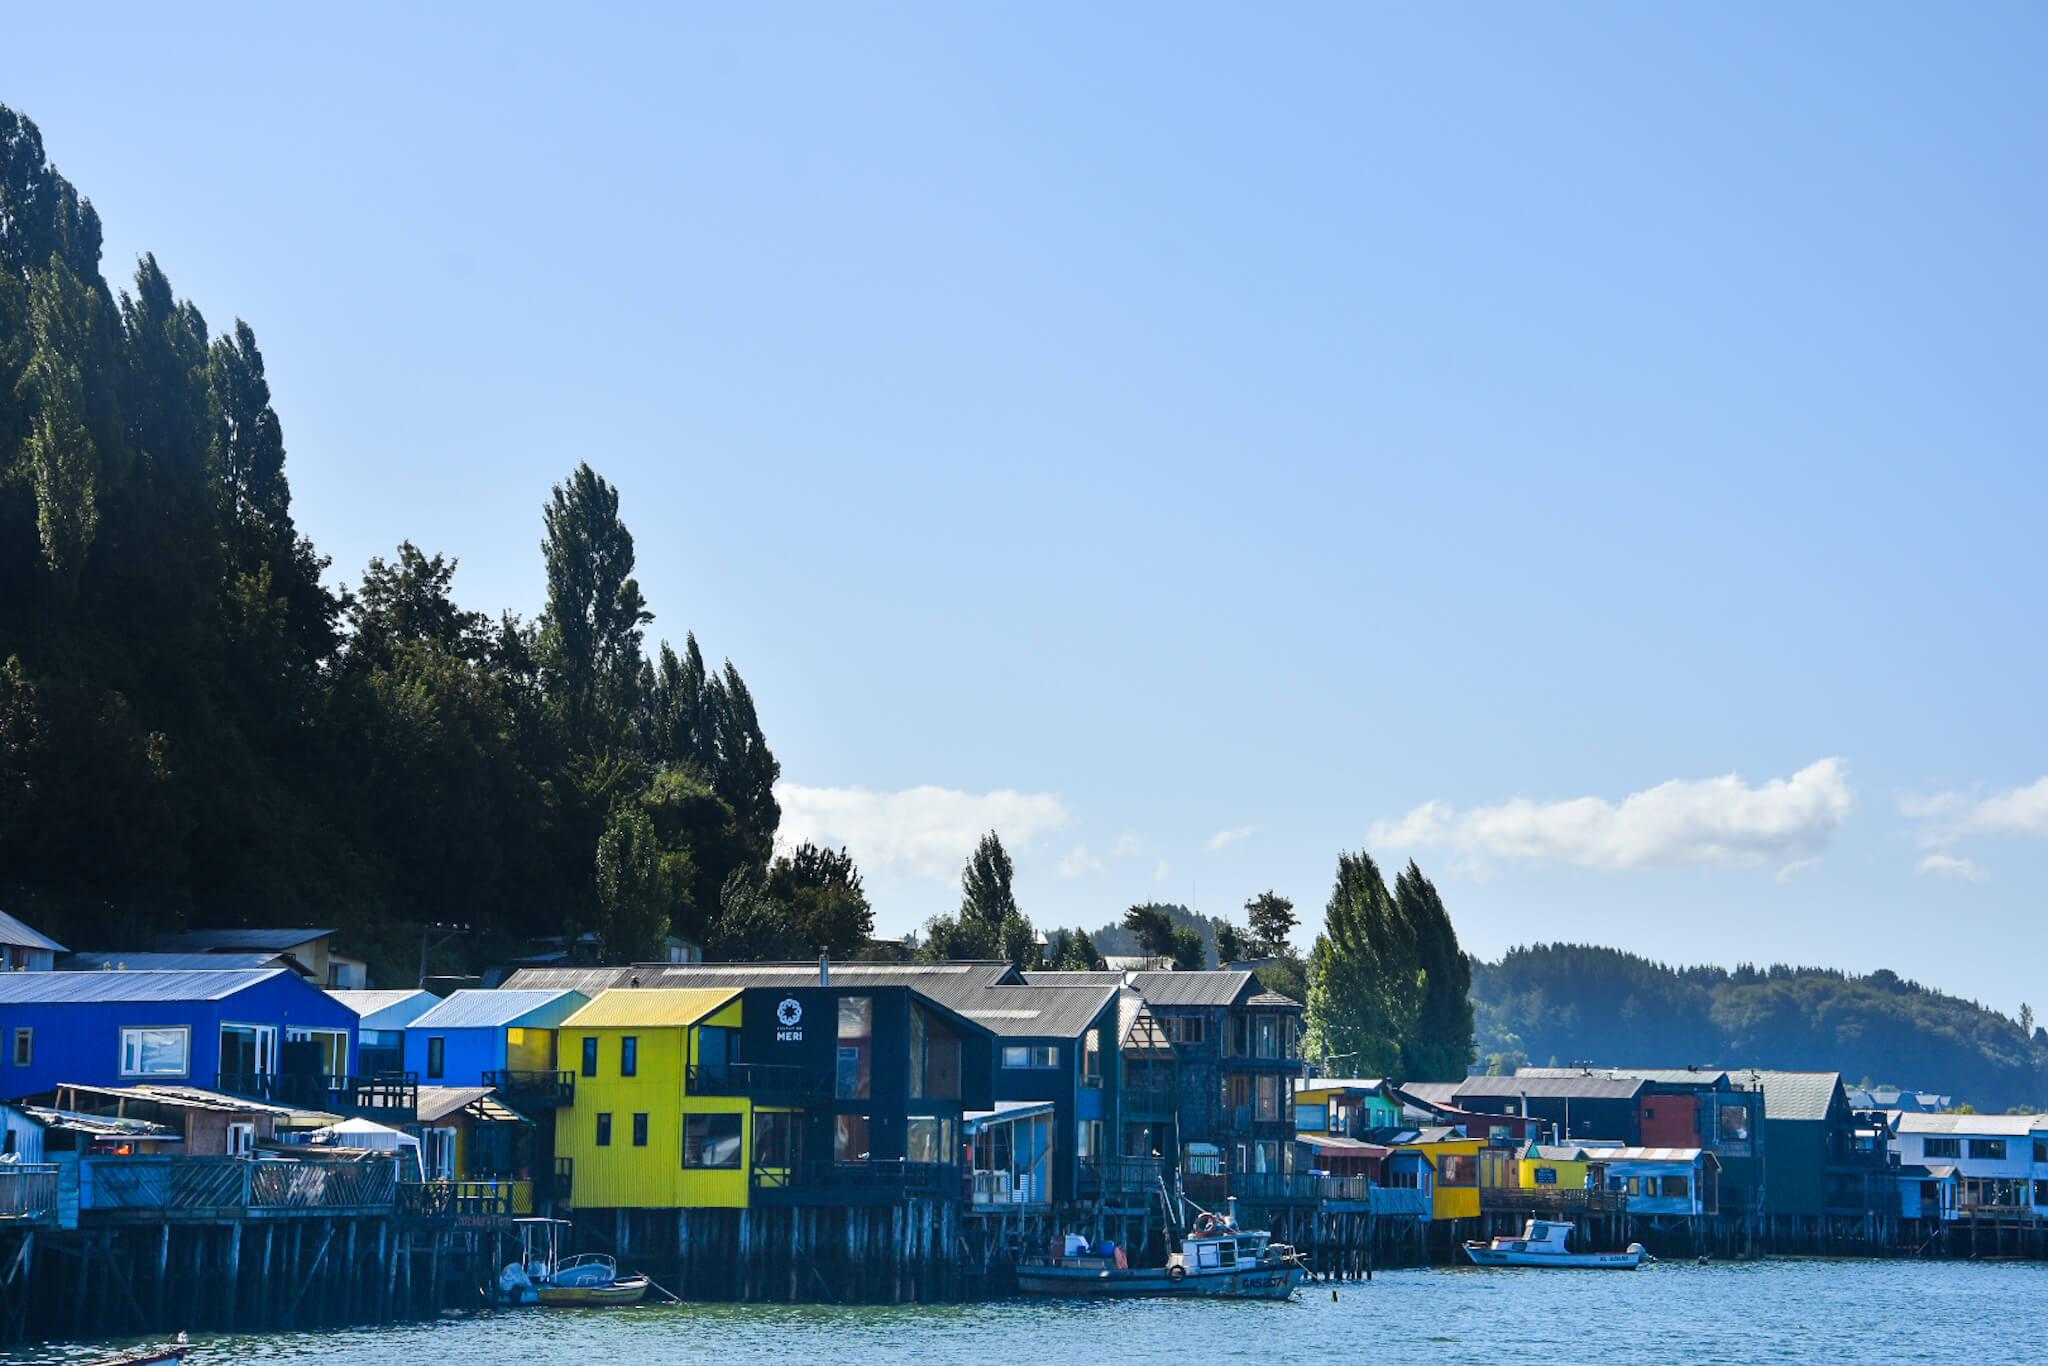 houses on stilts, Chiloe island, Chile